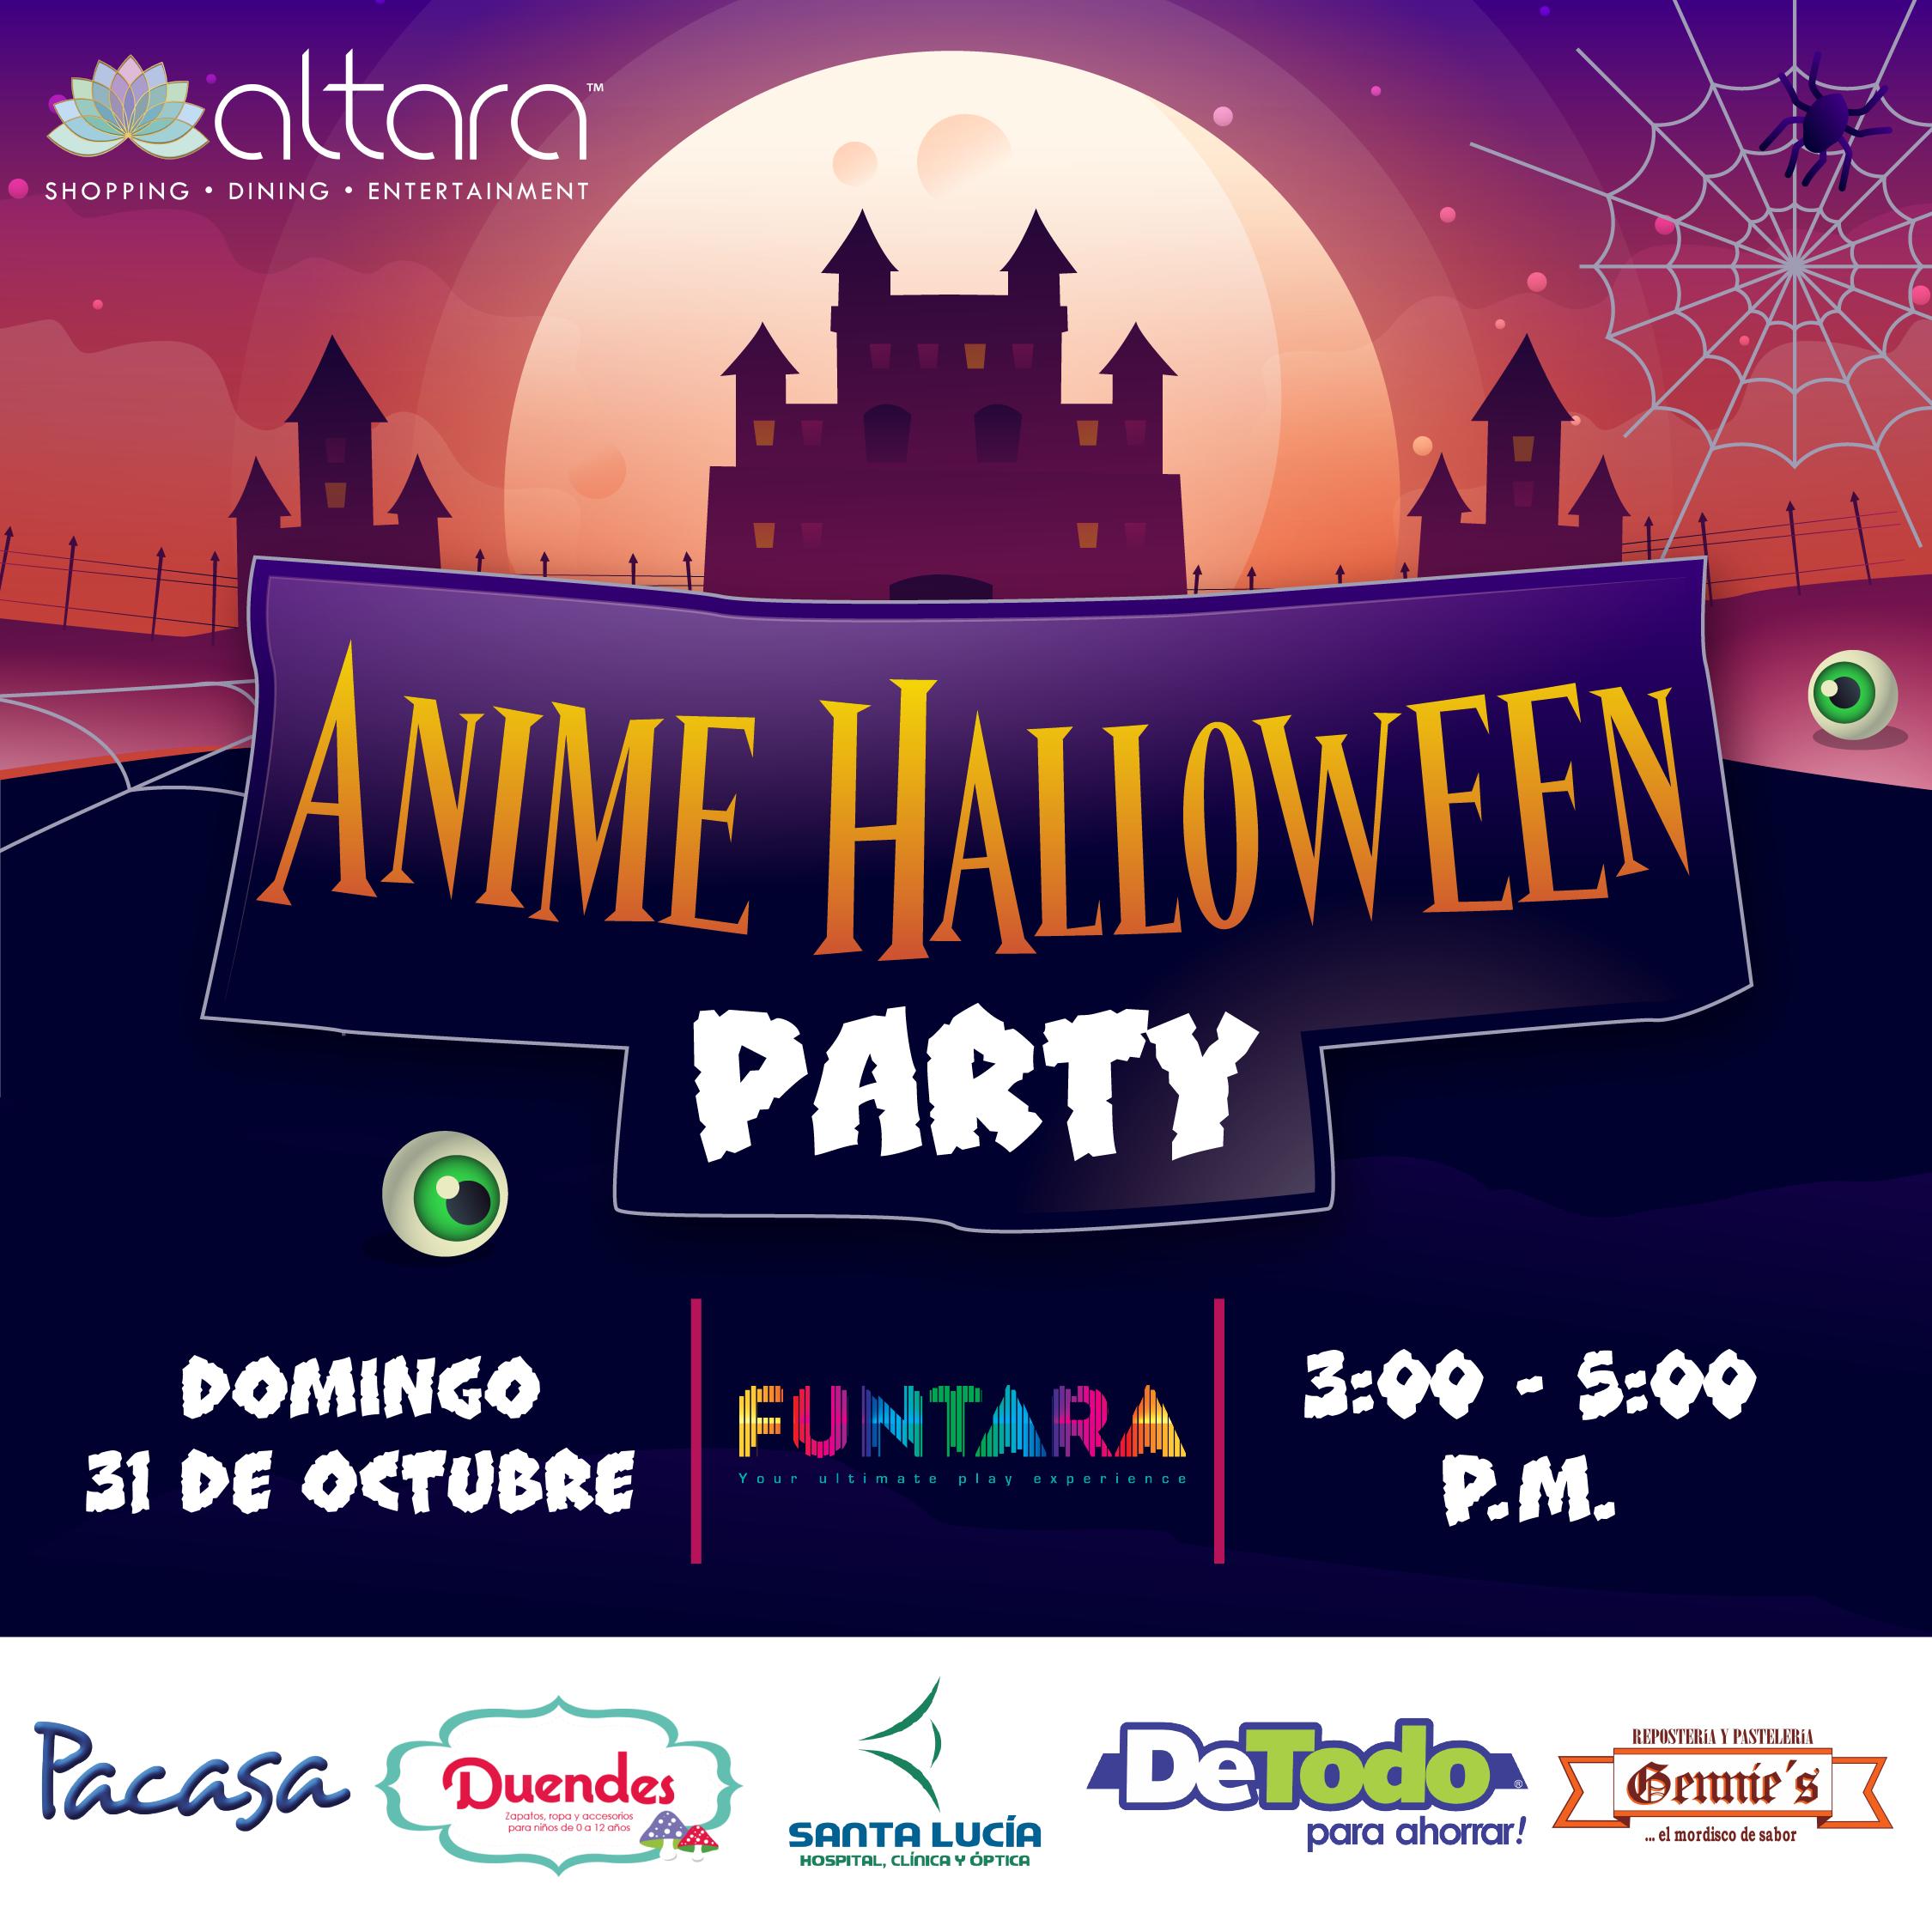 Anime halloween party!